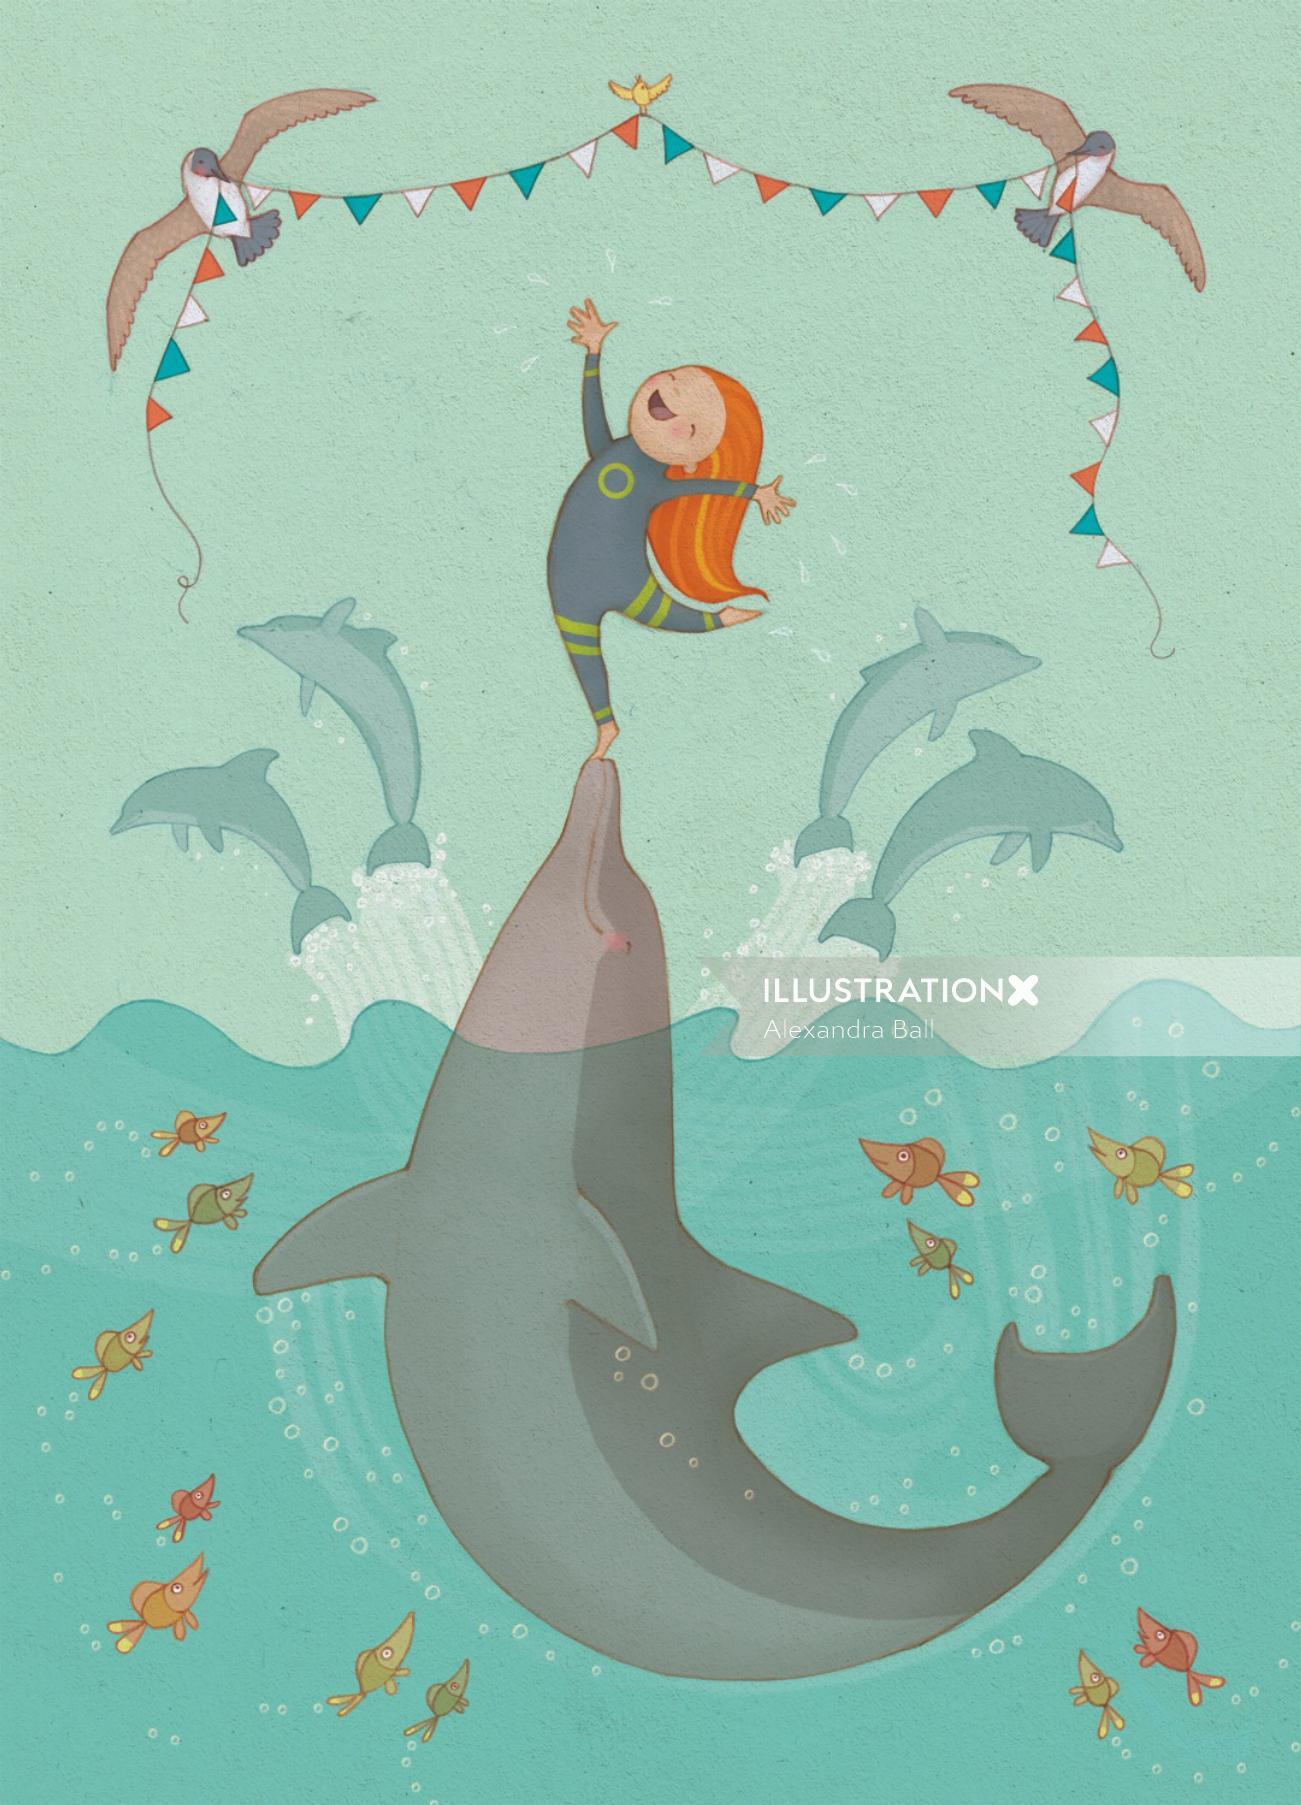 An illustration of girl doing acrobatics on dolphin